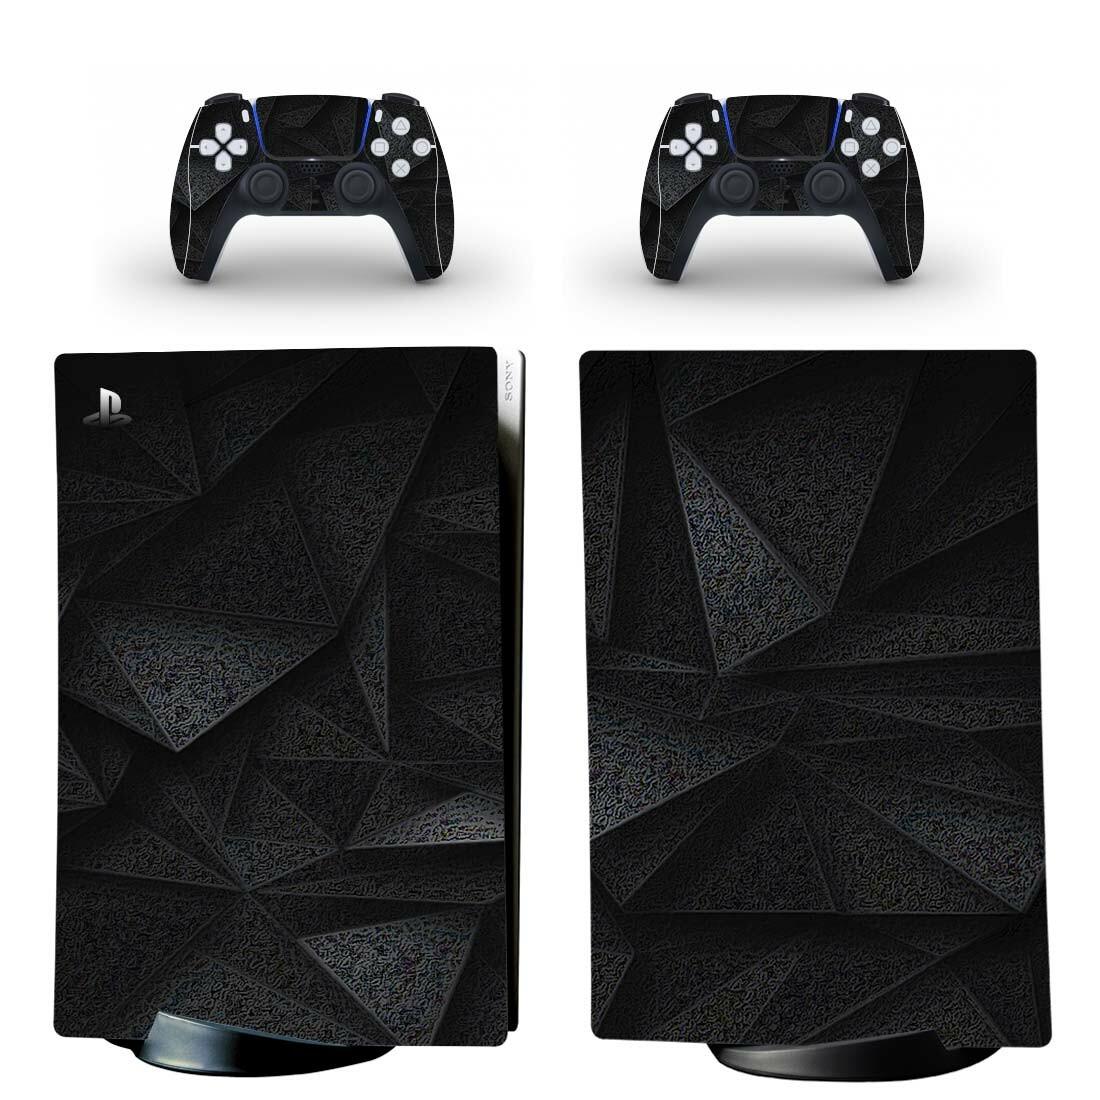 3D Black Diamond PS5 Digital Edition Skin Sticker Decal